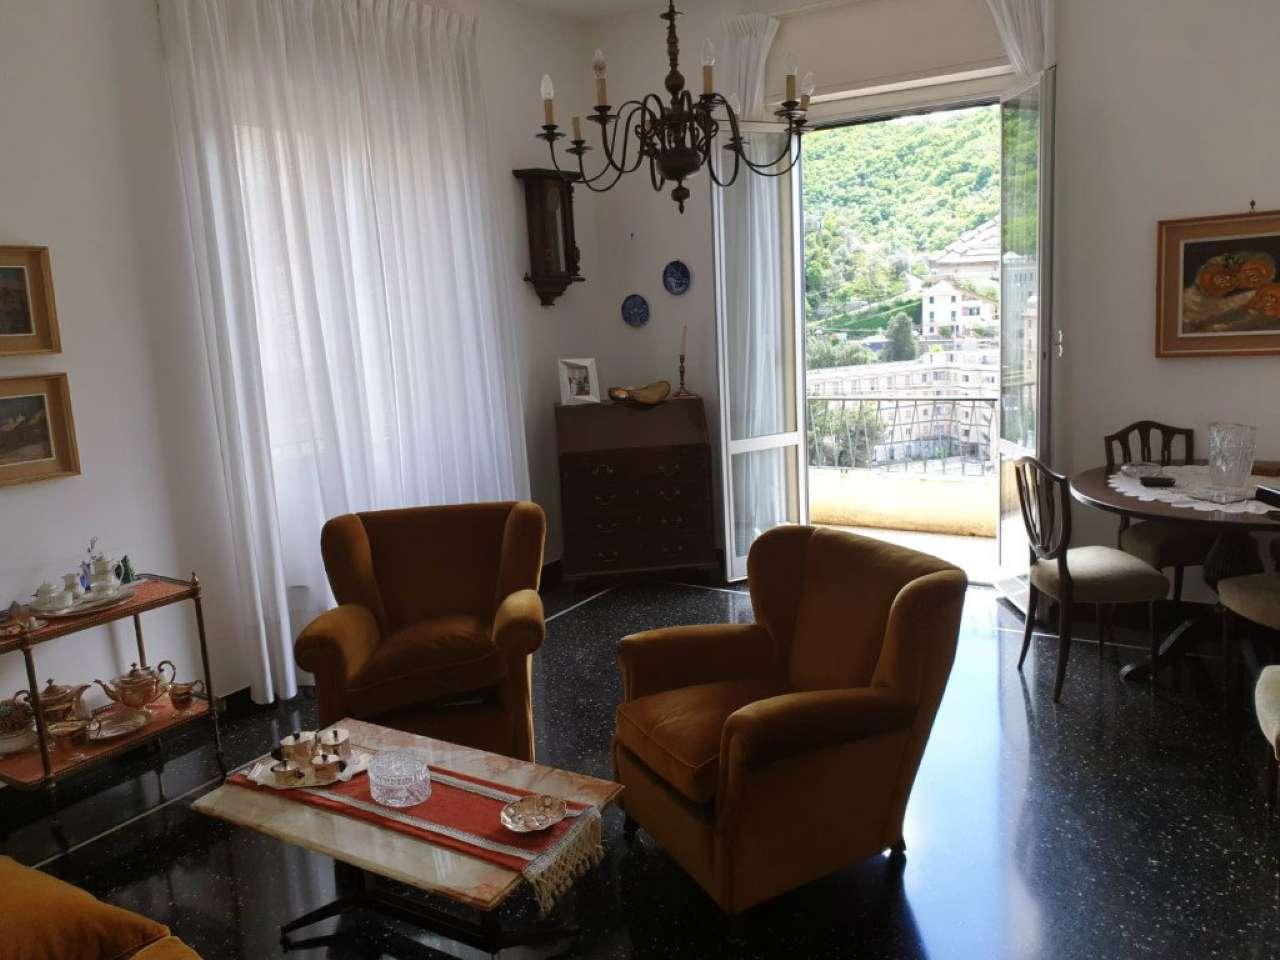 Foto 1 di Appartamento via Susanna Fontanarossa, Genova (zona Quezzi)